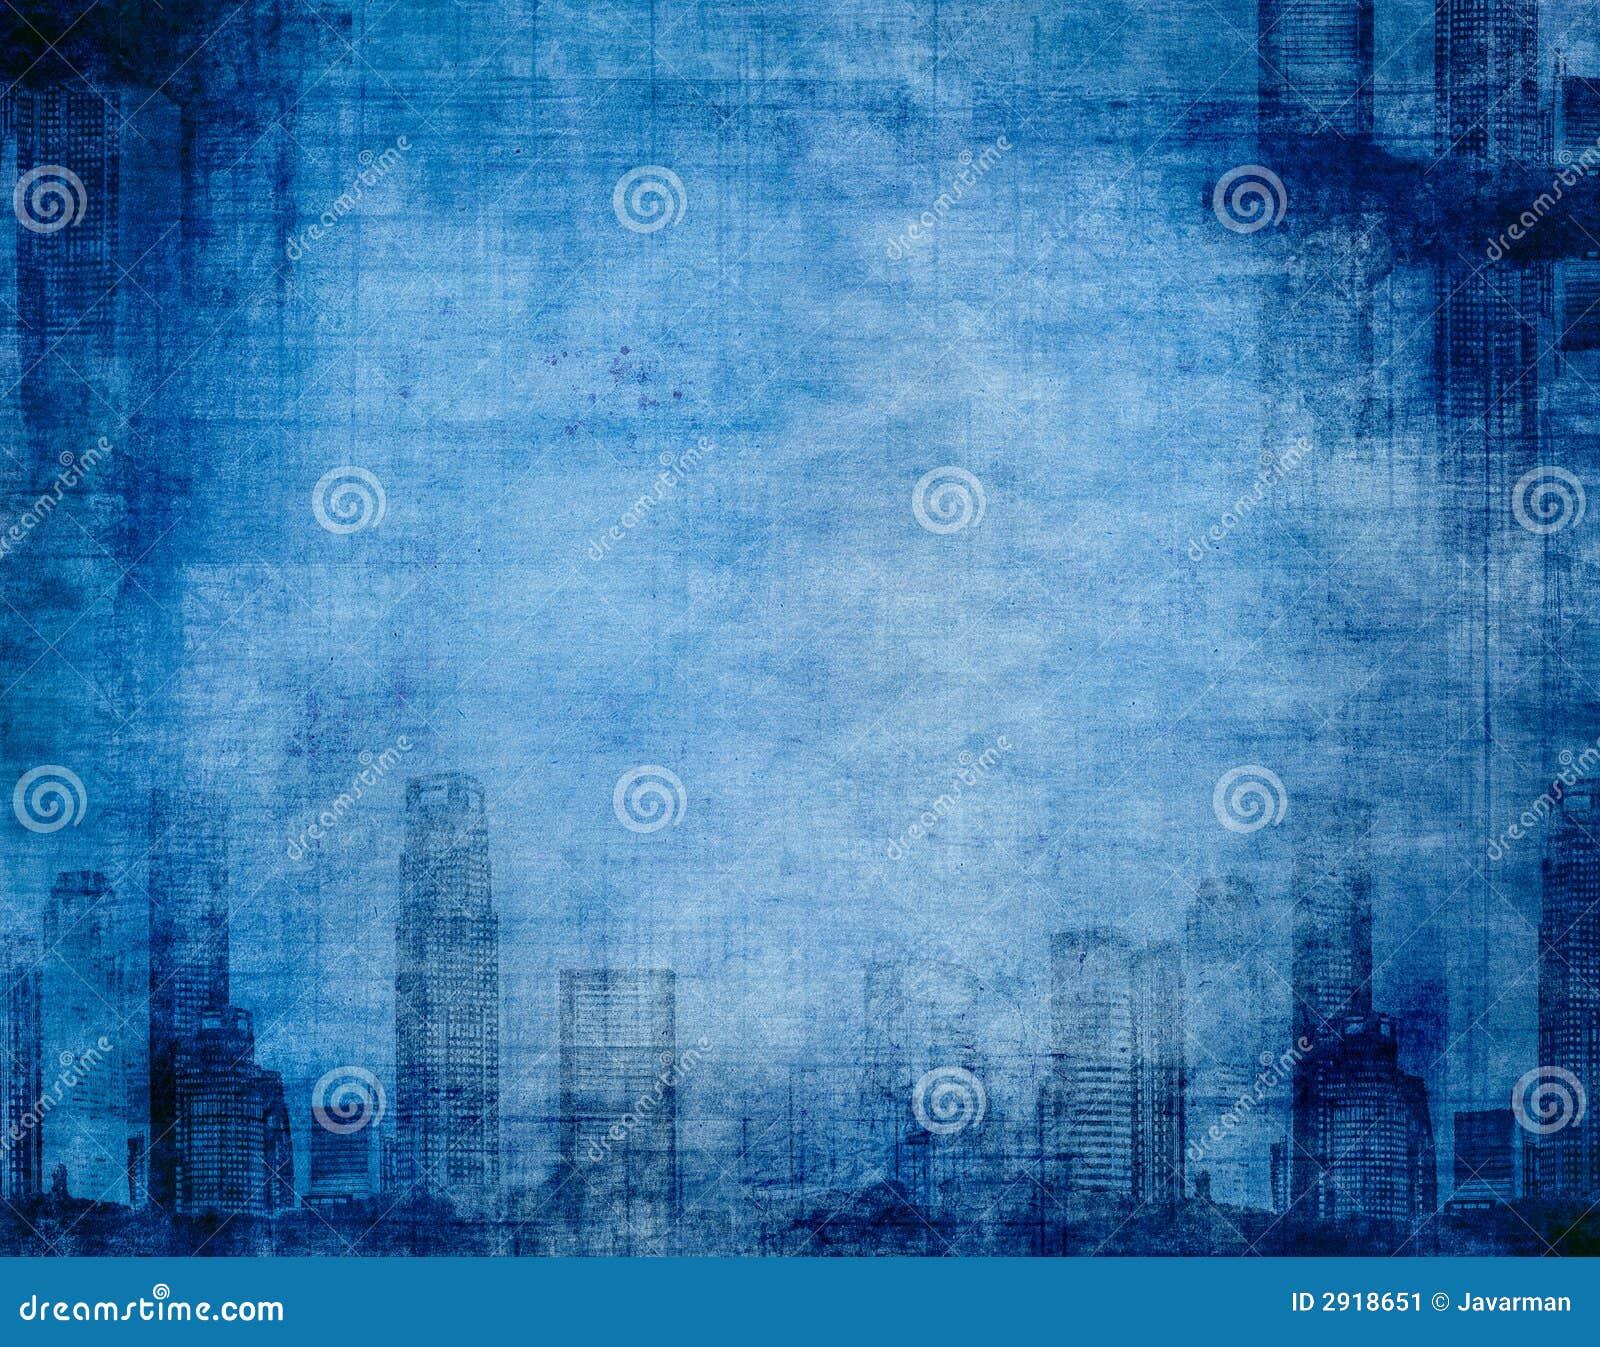 Grunge city blue